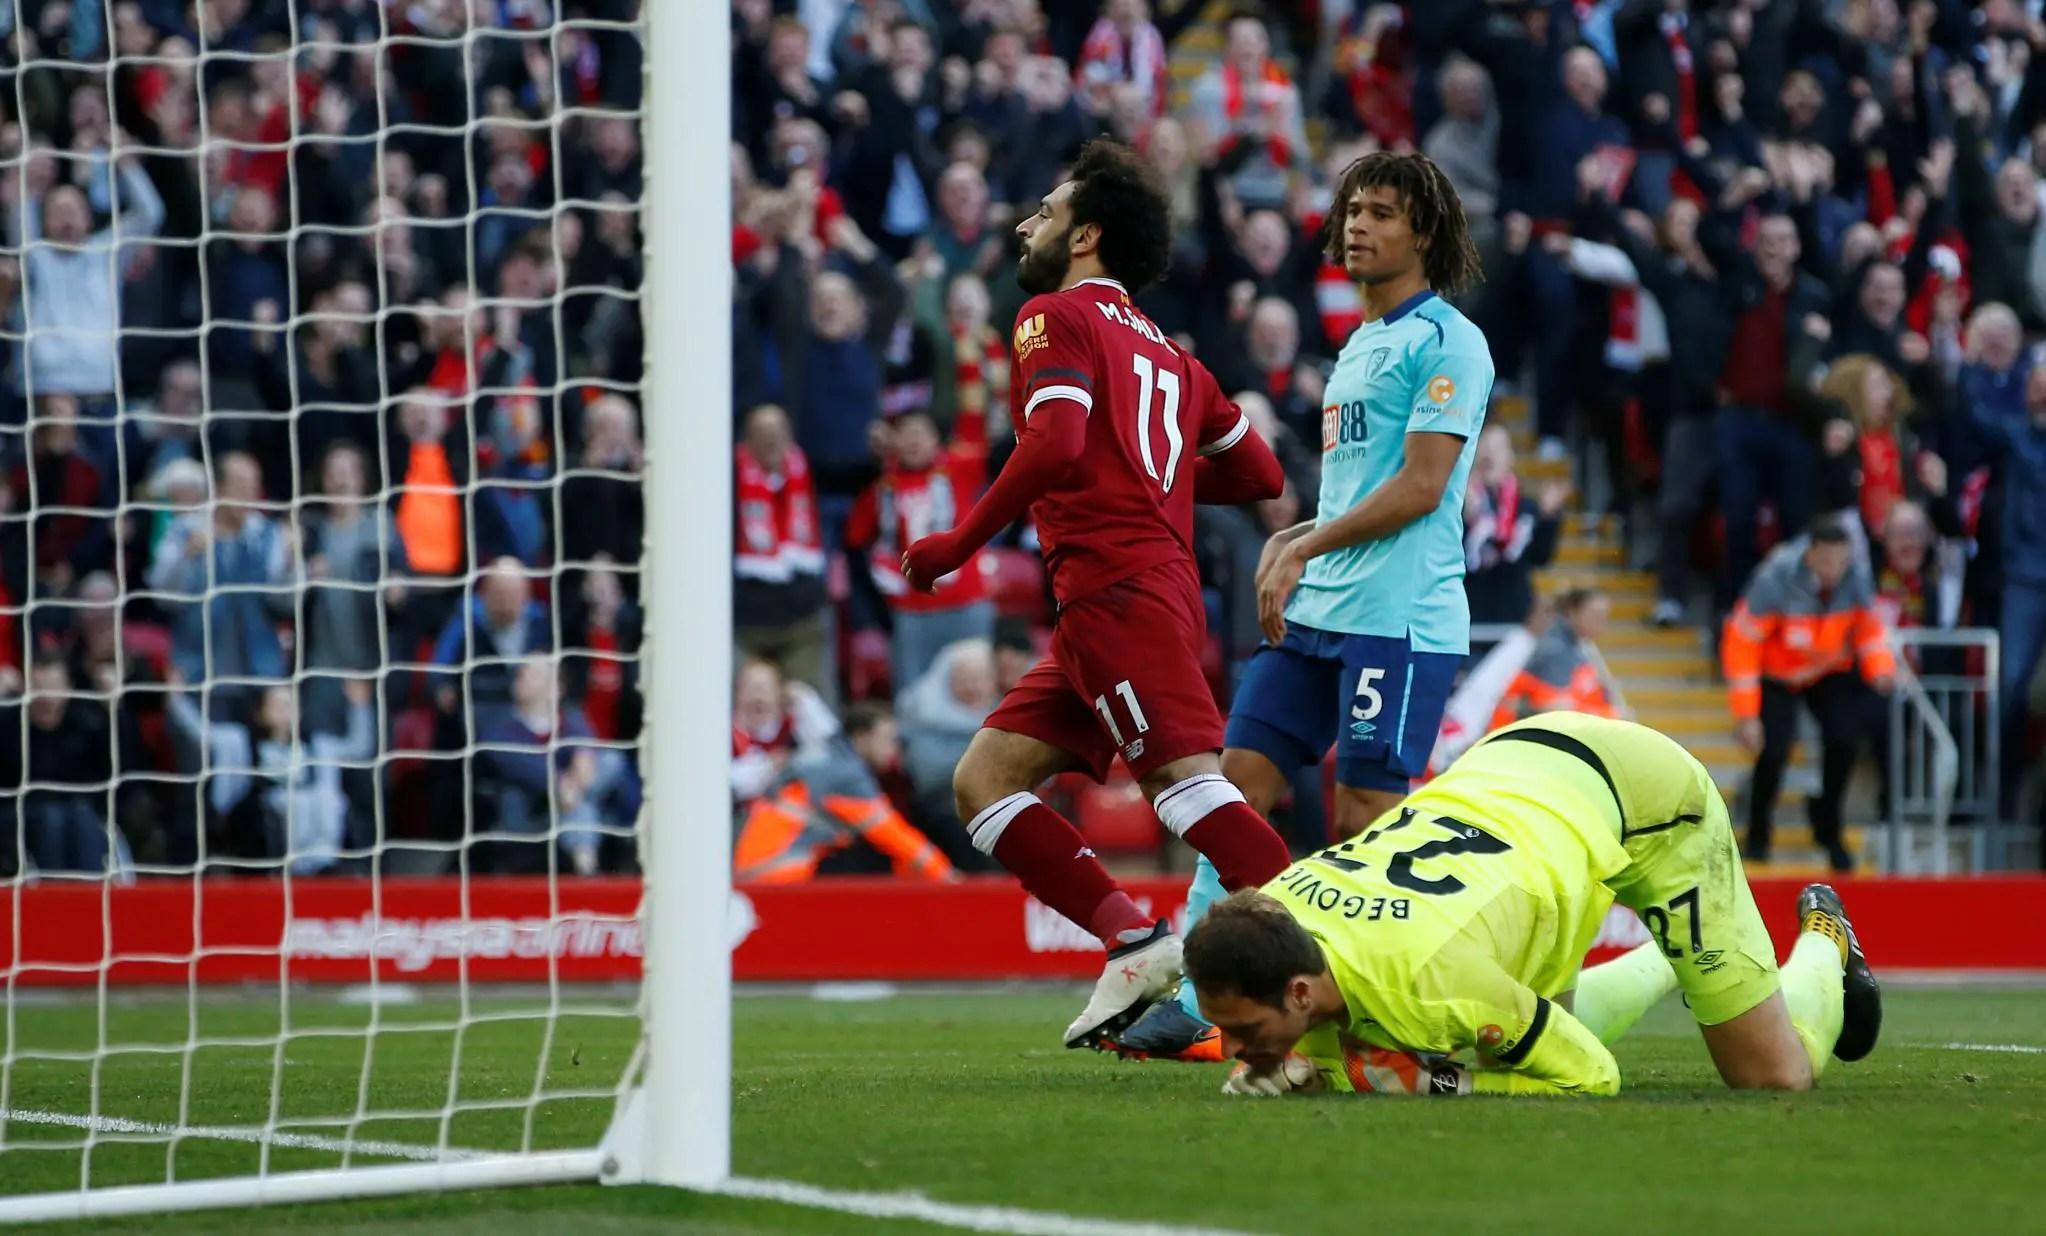 Salah, Mane Score Historic Goals As Liverpool Ease Past Bournemouth